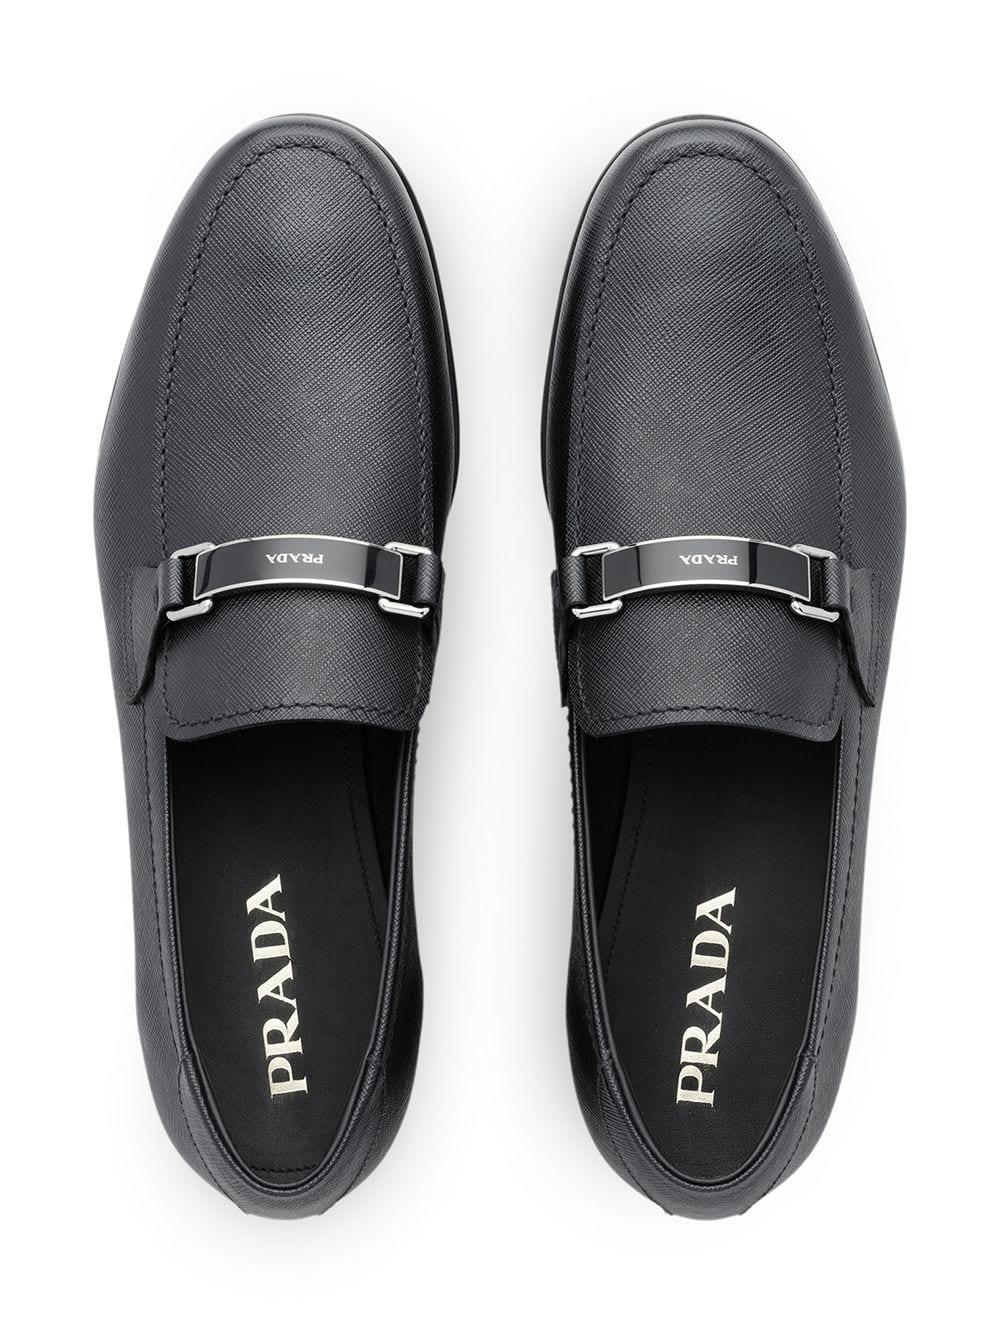 8dc7ff8b Men's Black Saffiano Leather Loafers